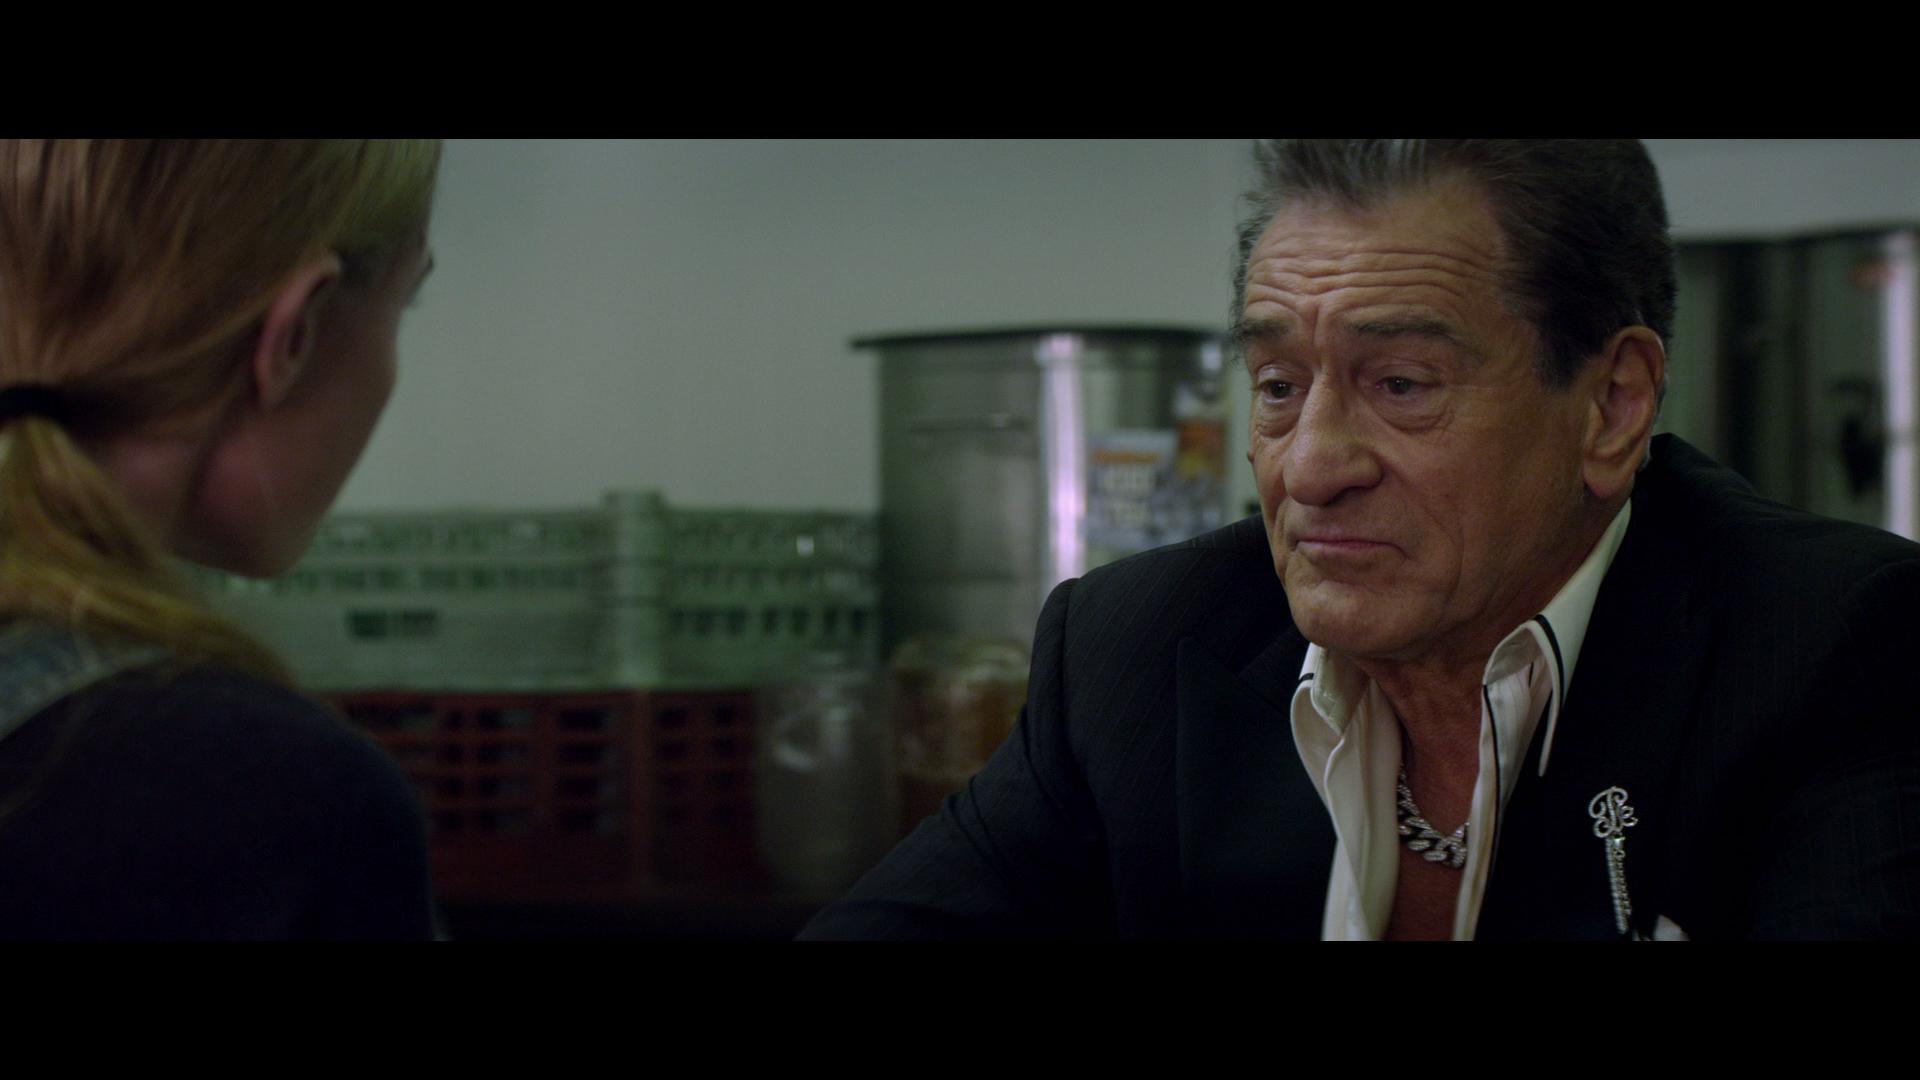 Скорость: Автобус 657 / Heist (2015) Blu-ray Remux 1080p от ivandubskoj | US Transfer | D, A